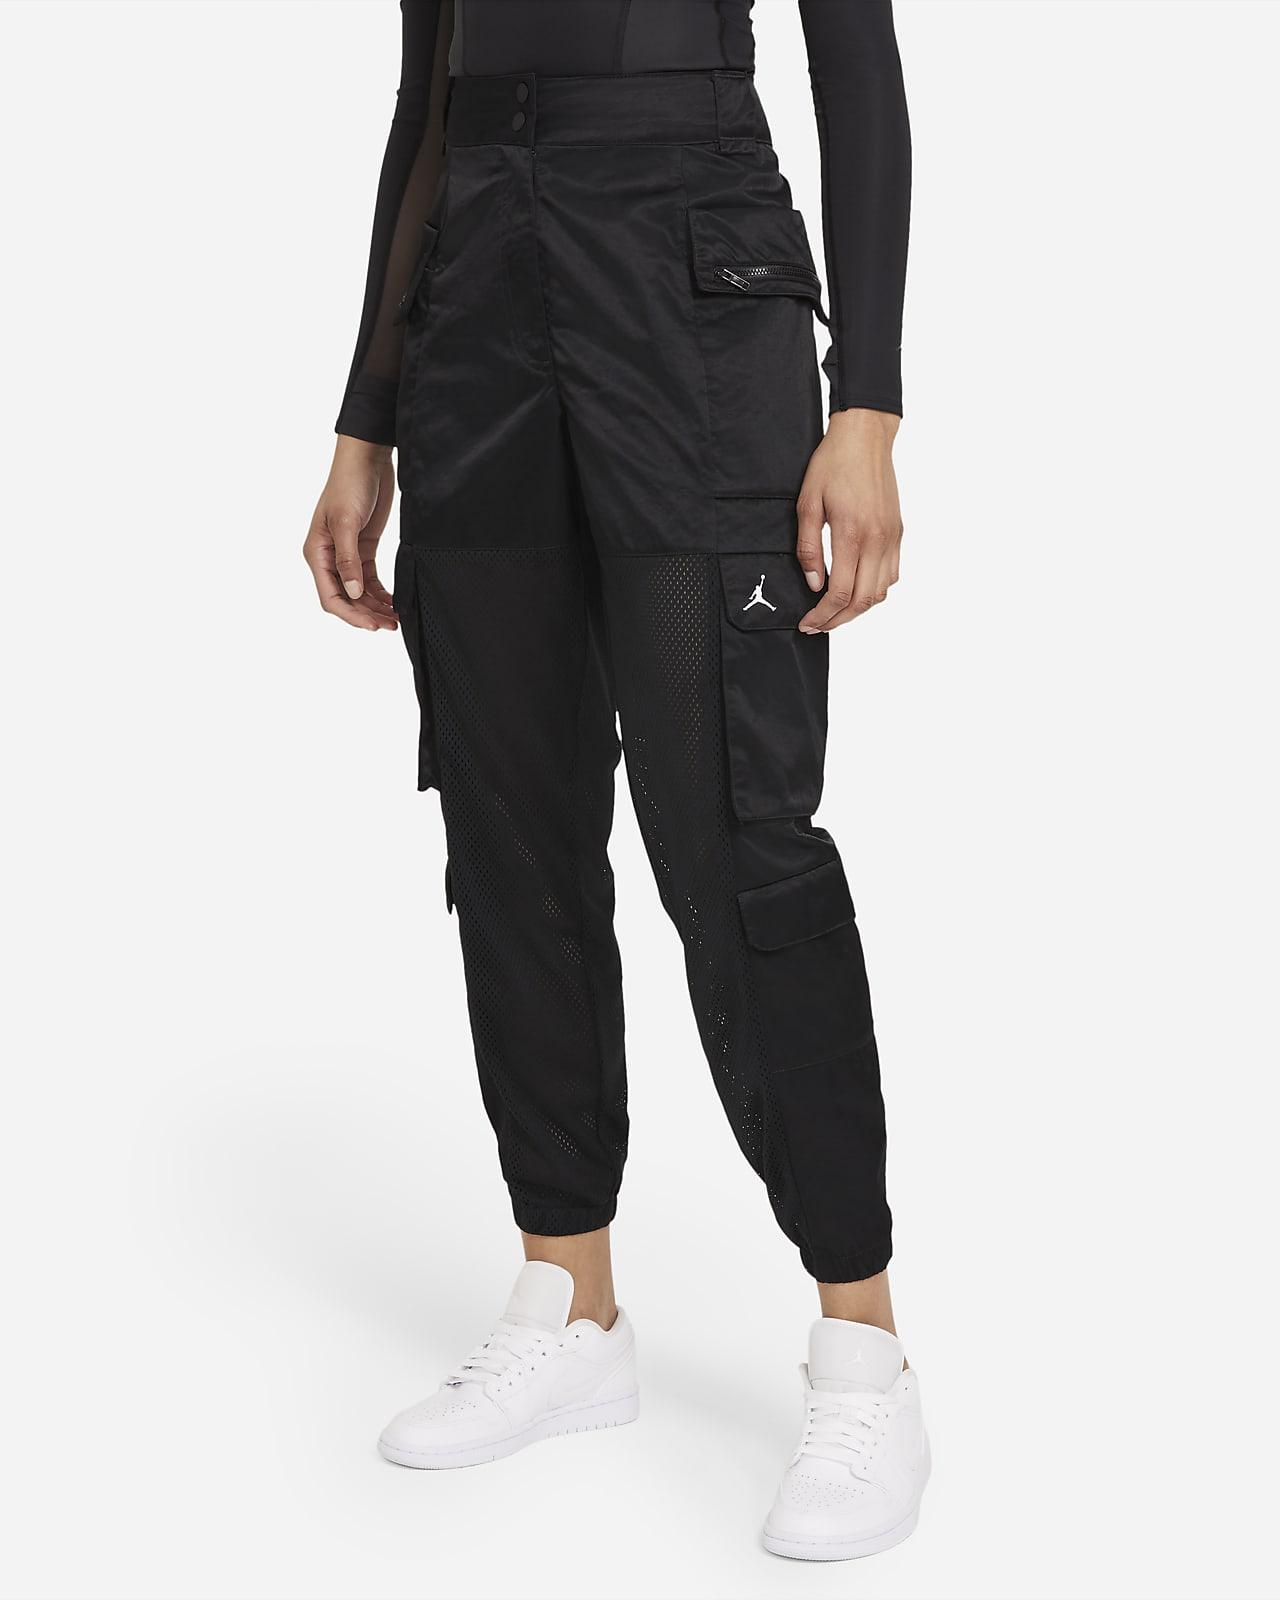 Pantalones cargo para mujer Jordan Heatwave